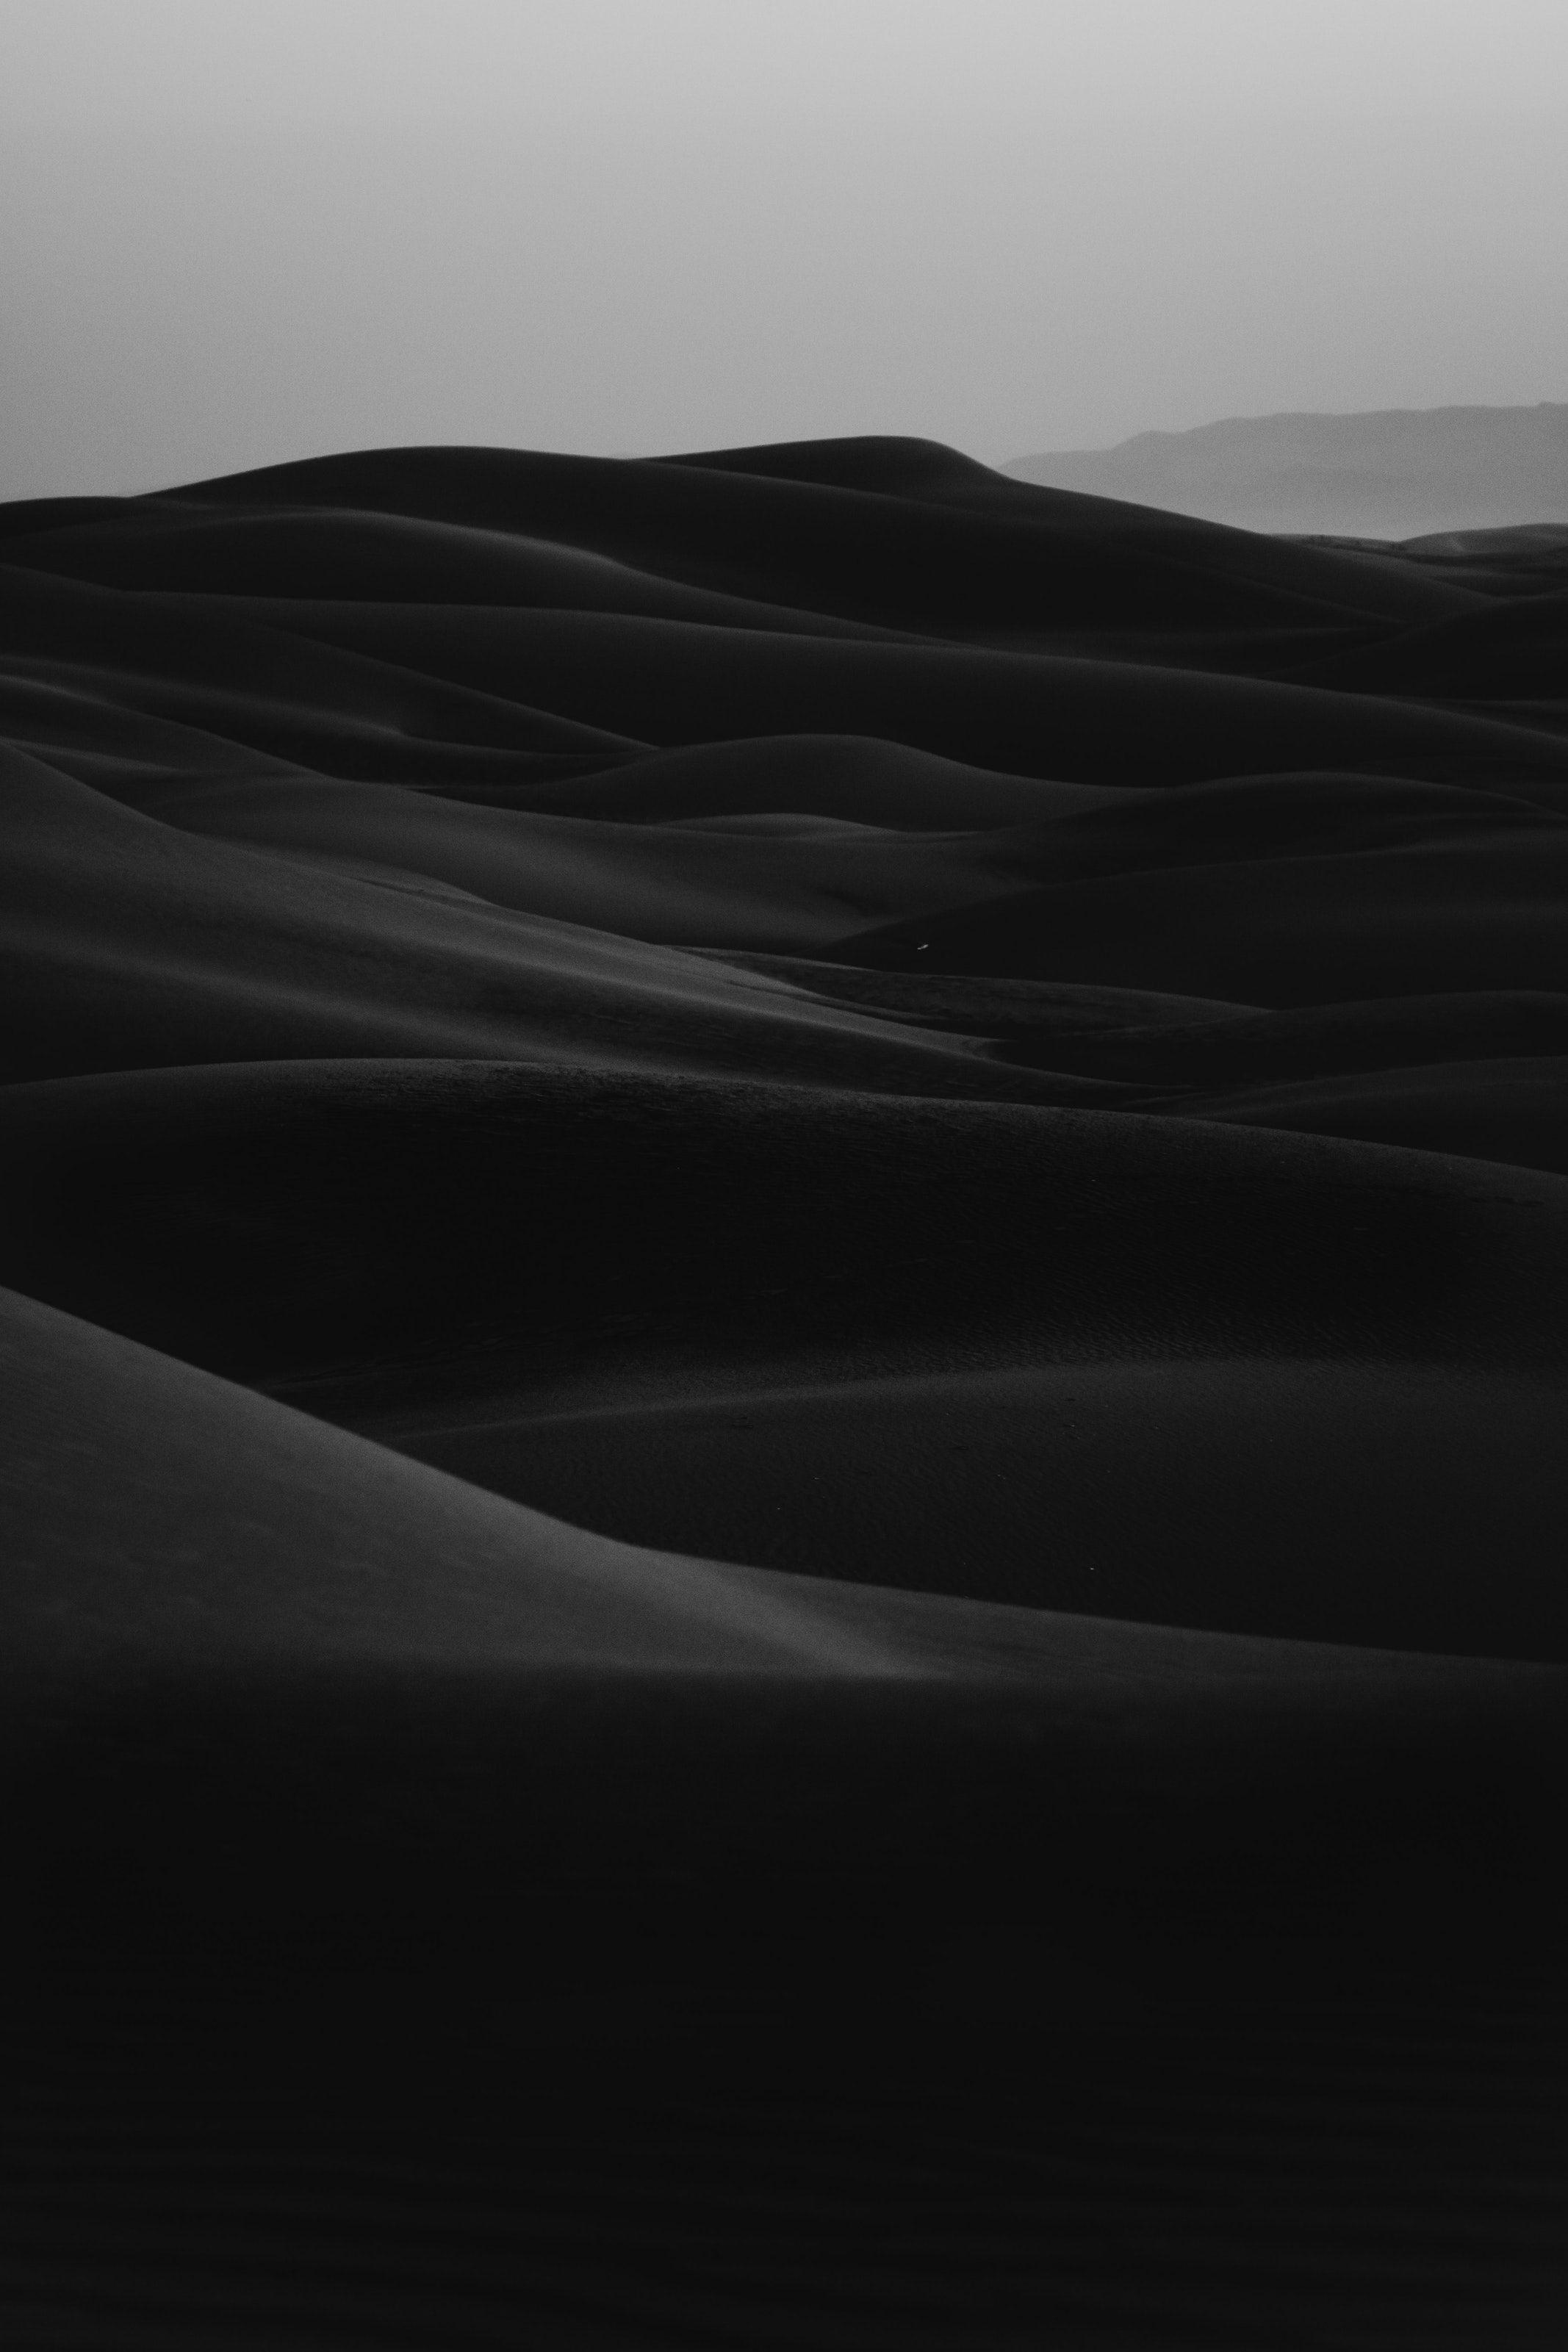 Grayscale Photo Of Desert Black And White Wallpaper Black Picture Black Sand